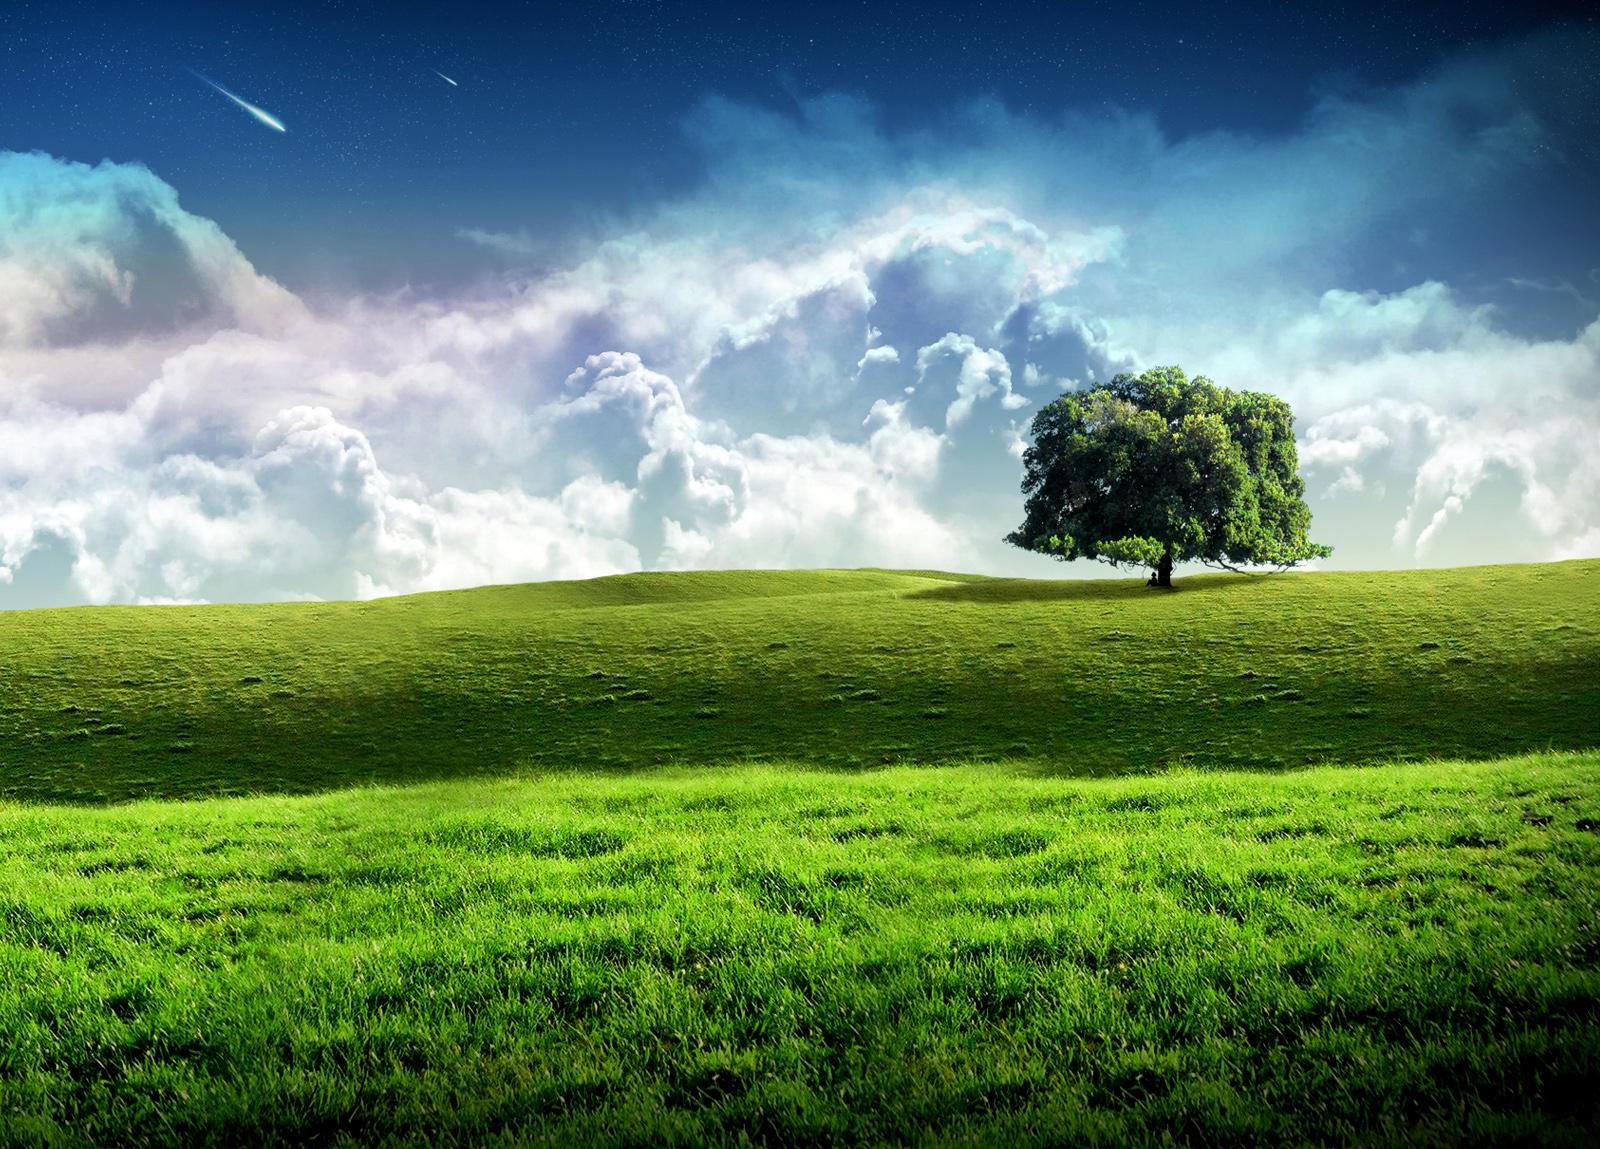 Prabhas Wallpapers Free Download Mobile: Windows Nature Pc Walls New Xp Wallpapers Windows7windows8